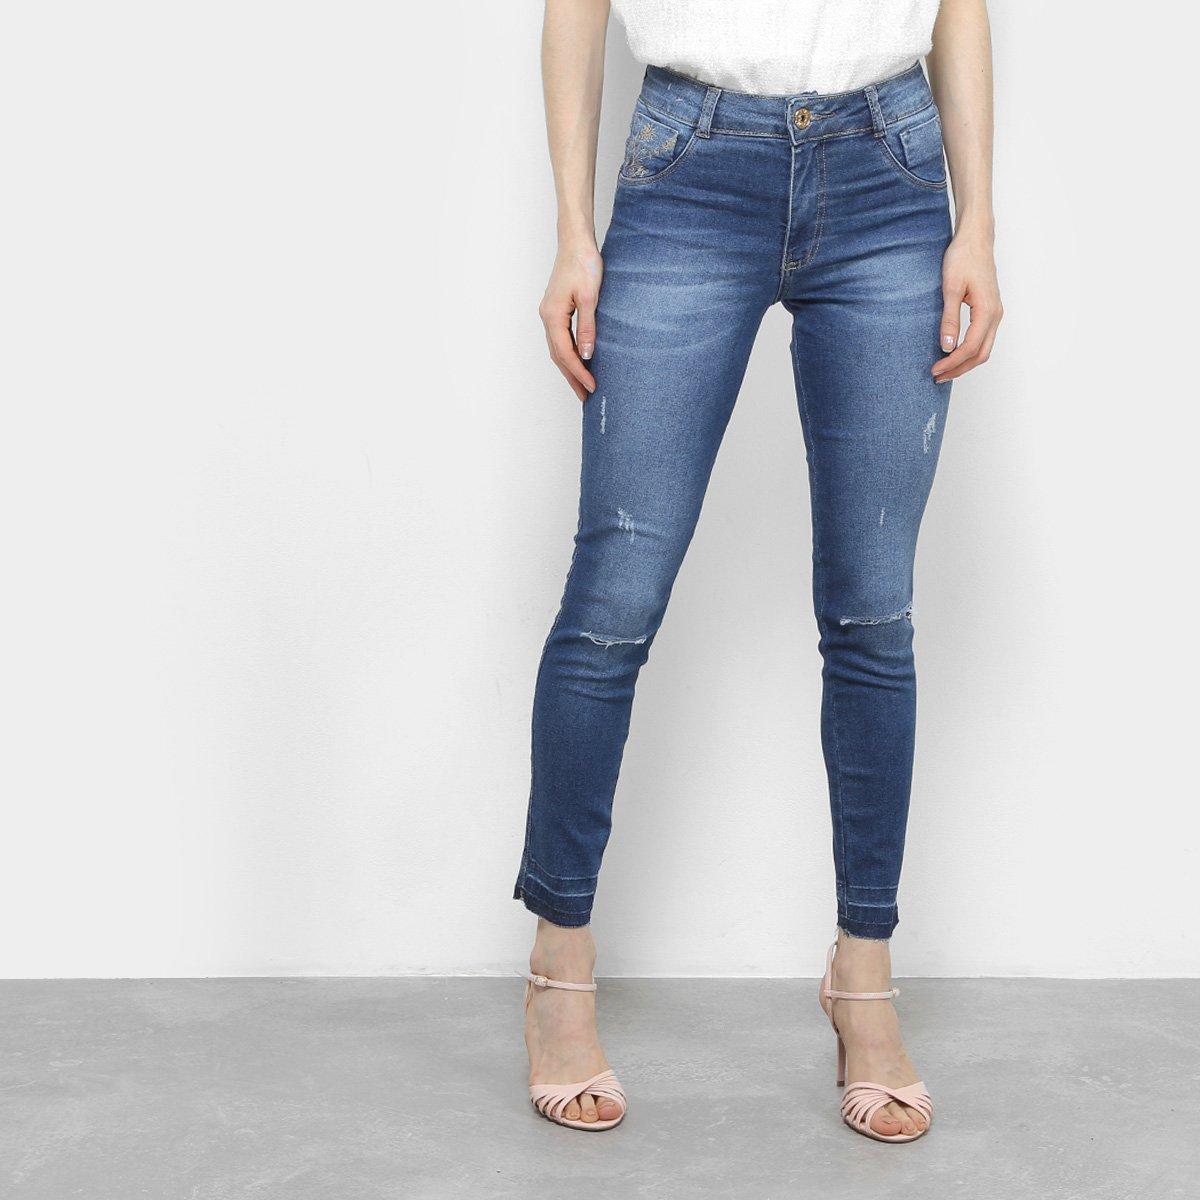 3f02b9082 Calça Jeans Skinny Biotipo Estonada Cintura Alta Feminina - Tam  40 ...